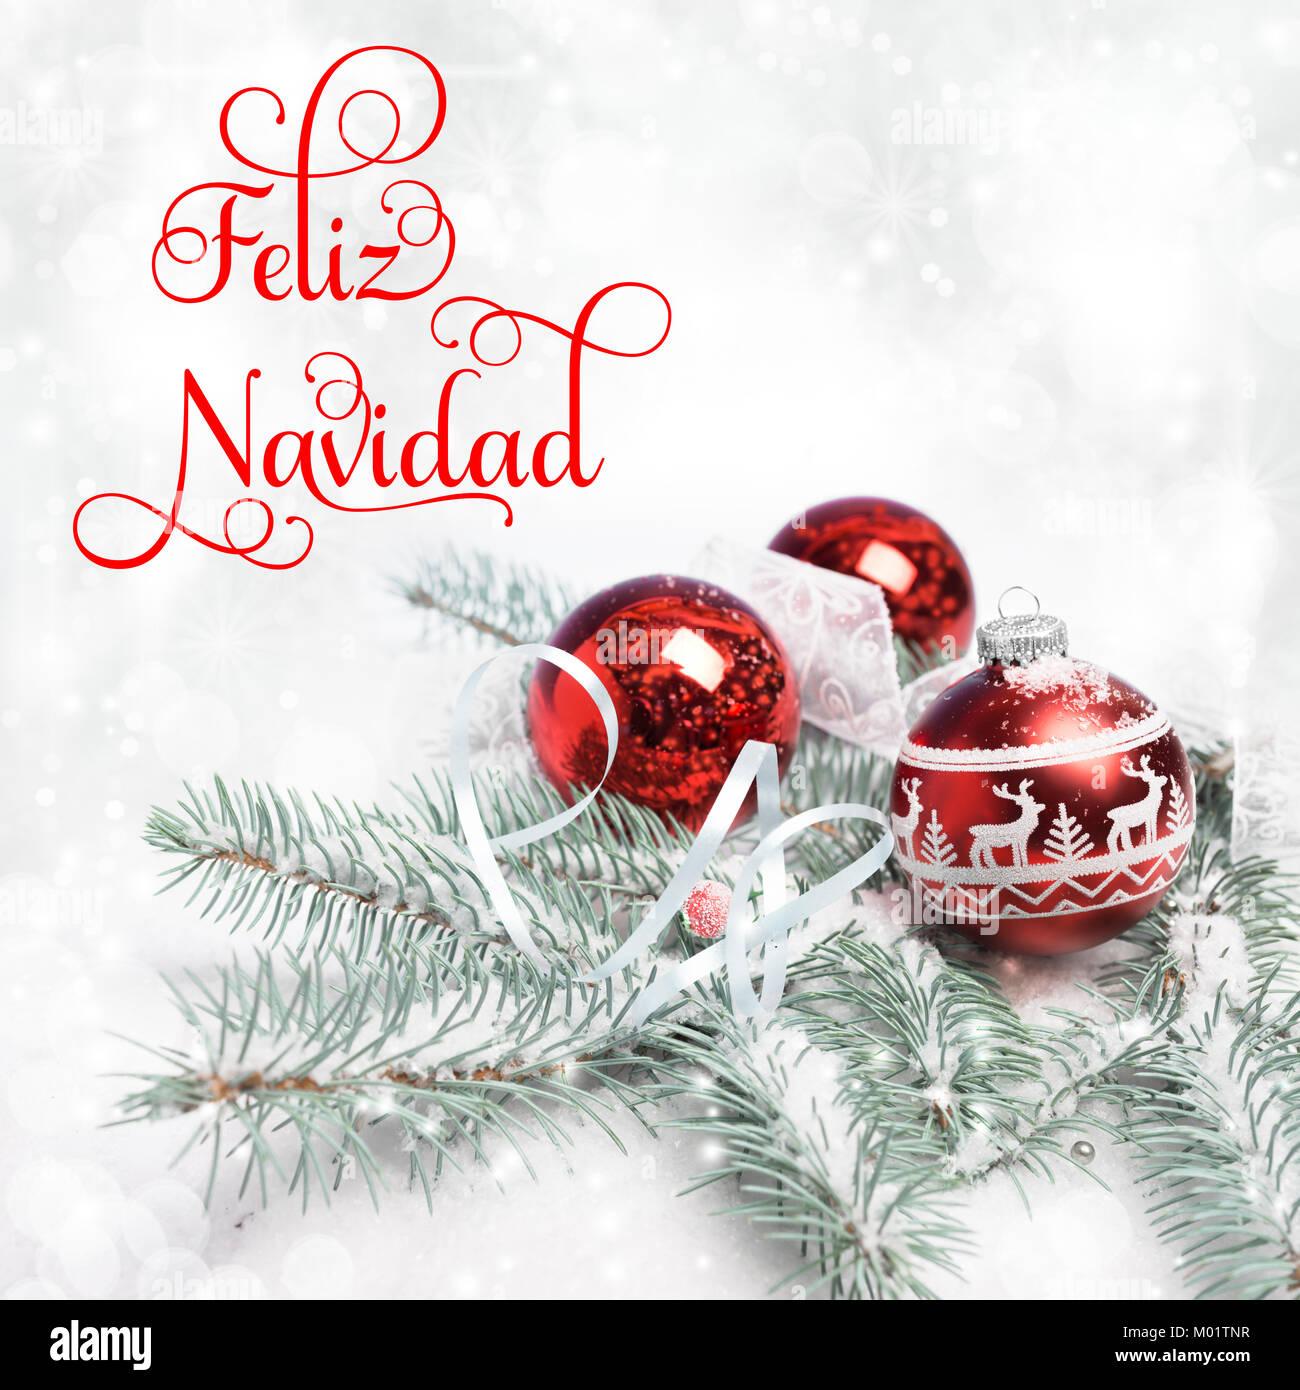 Feliz Navidad Cristmas.Feliz Navidad Stock Photos Feliz Navidad Stock Images Alamy